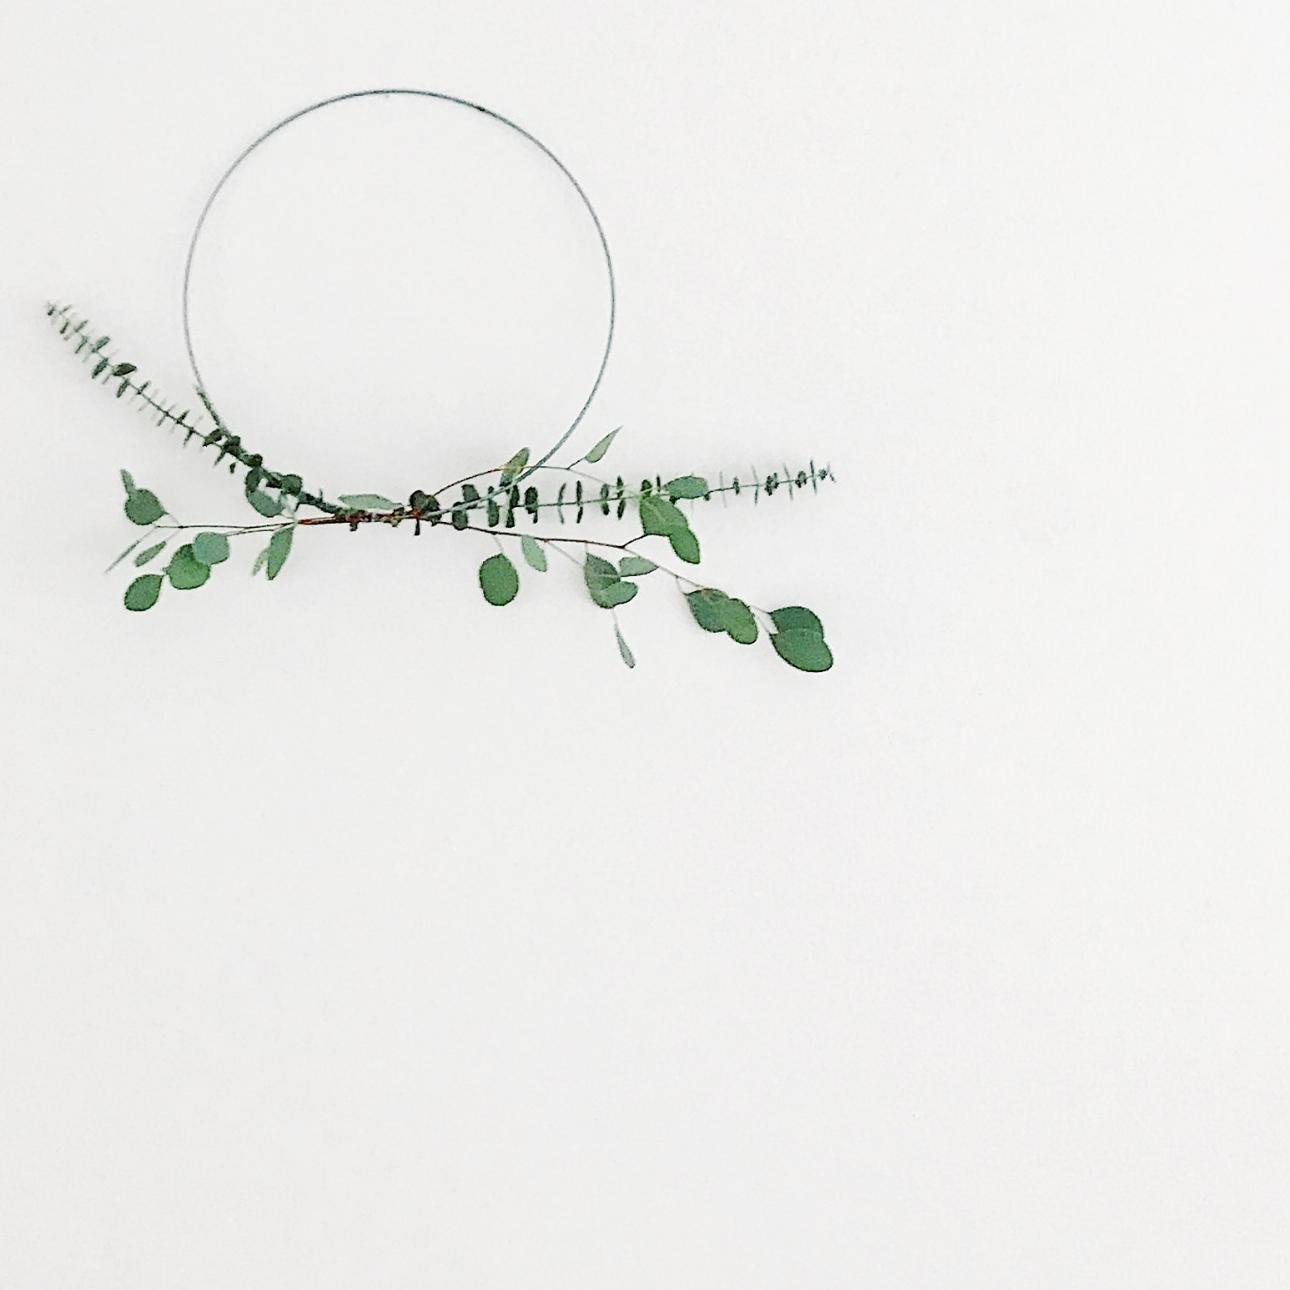 kerstkrans eucalyptus takken